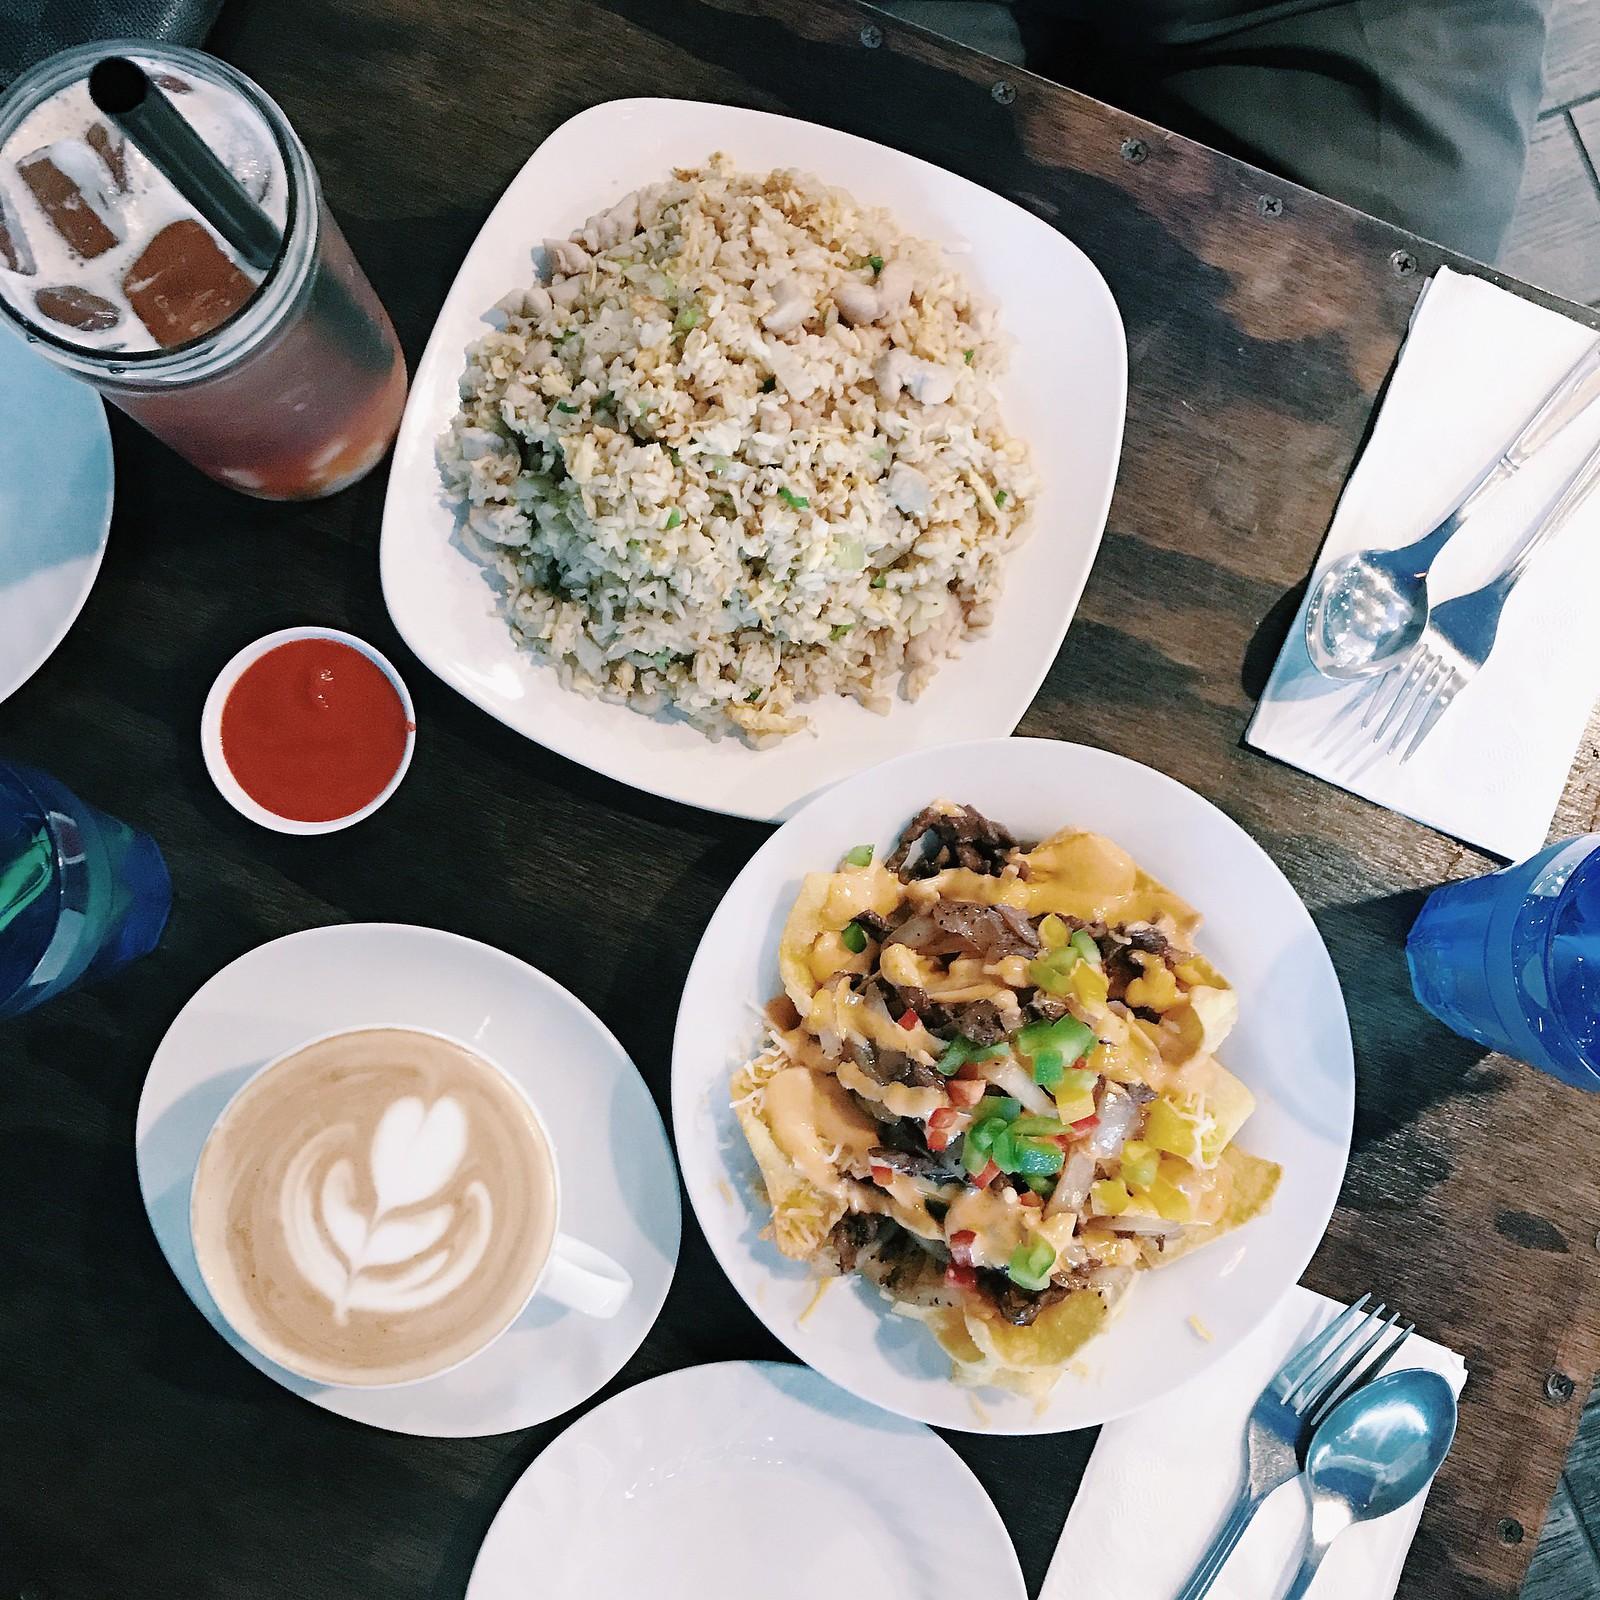 0144-bleu-house-foodie-hipster-coffeeart-coffeeshopcorners-lifestyle-elizabeeetht-flatlay